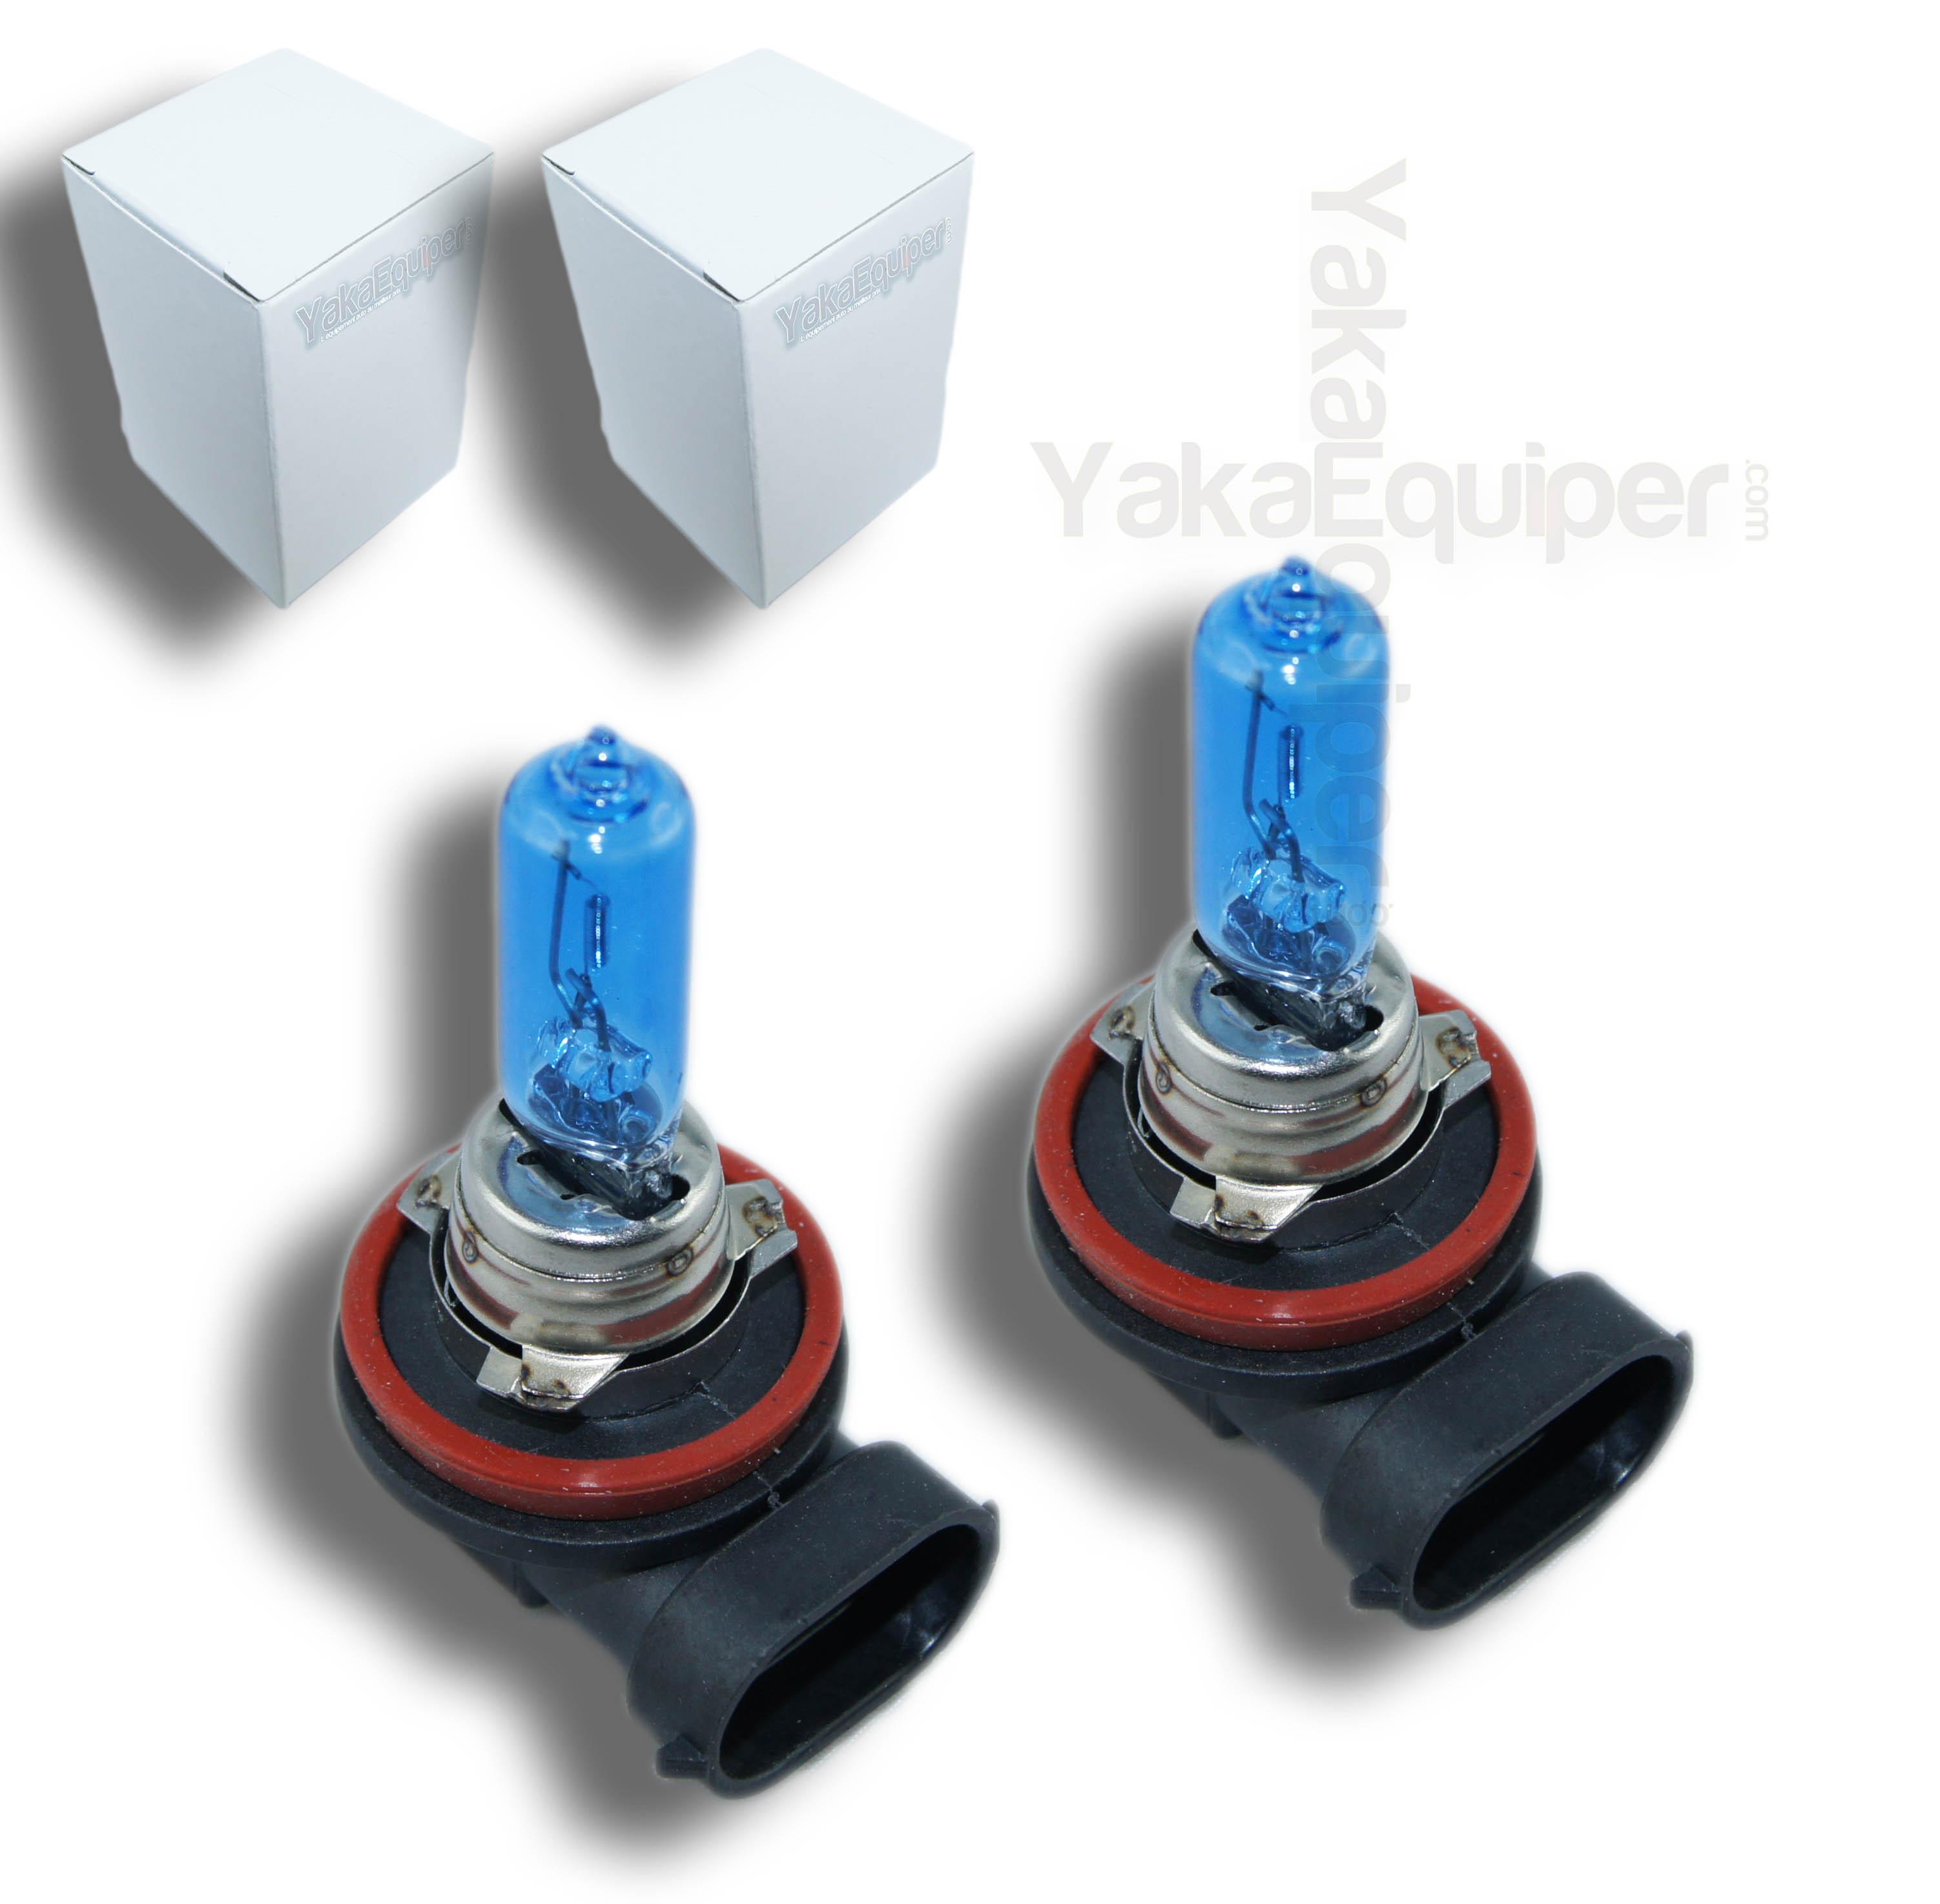 lampe h7 effet xenon x ampoules h w v super white francexenon with lampe h7 effet xenon. Black Bedroom Furniture Sets. Home Design Ideas